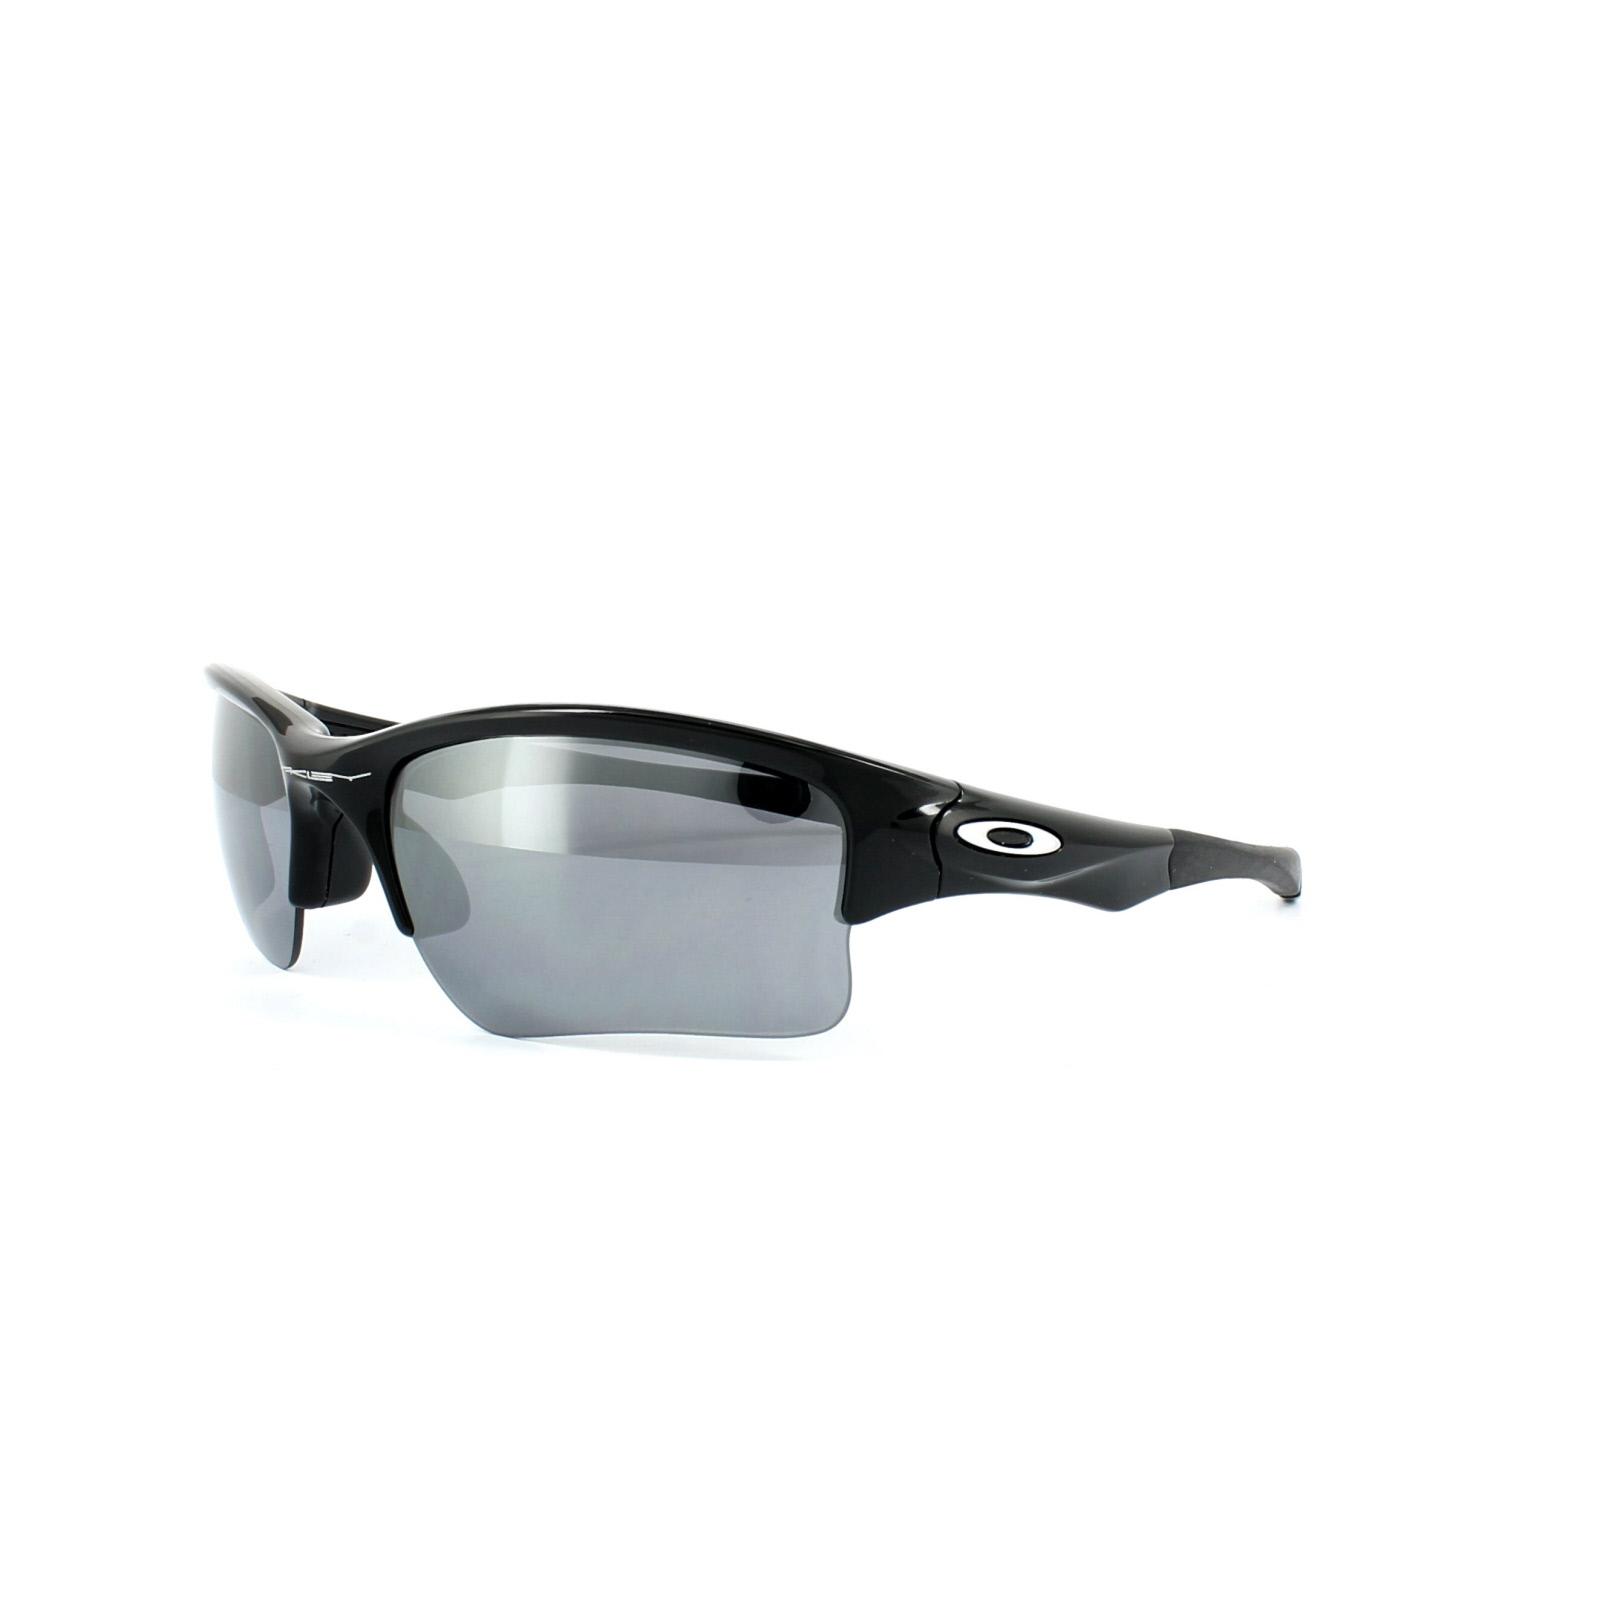 cheap oakley quarter jacket sunglasses